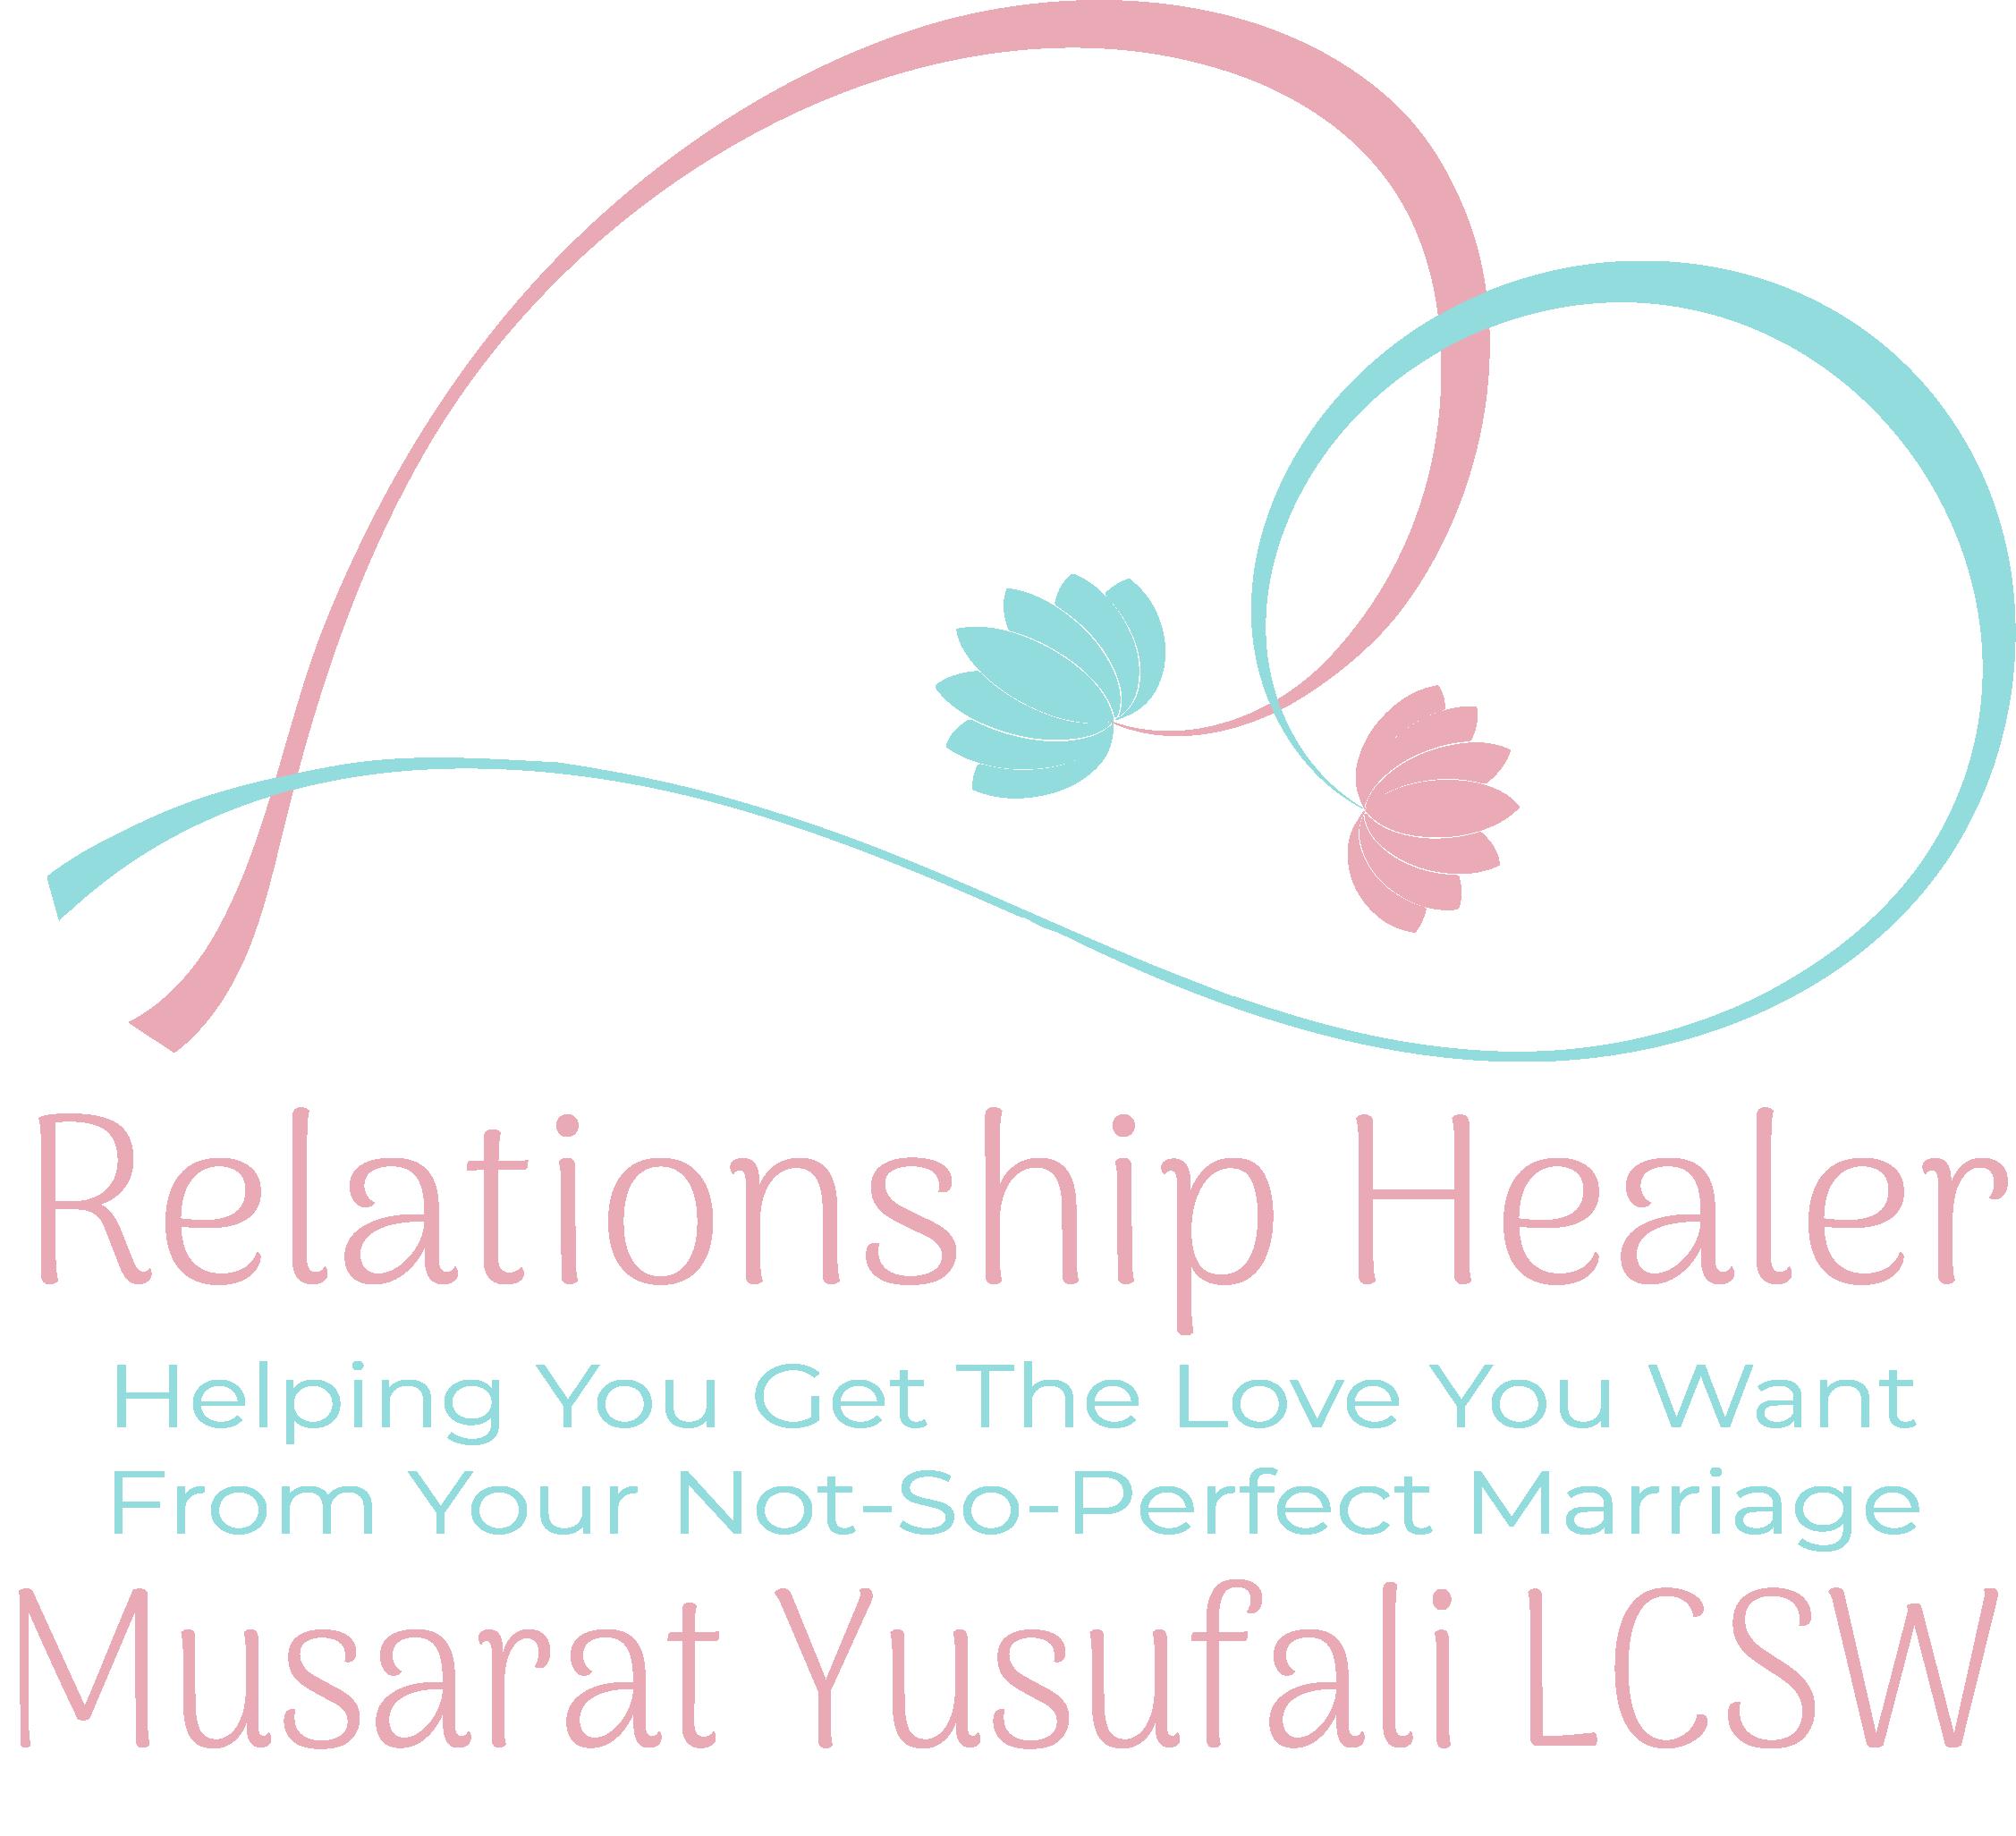 Musarat Yusufali LCSW